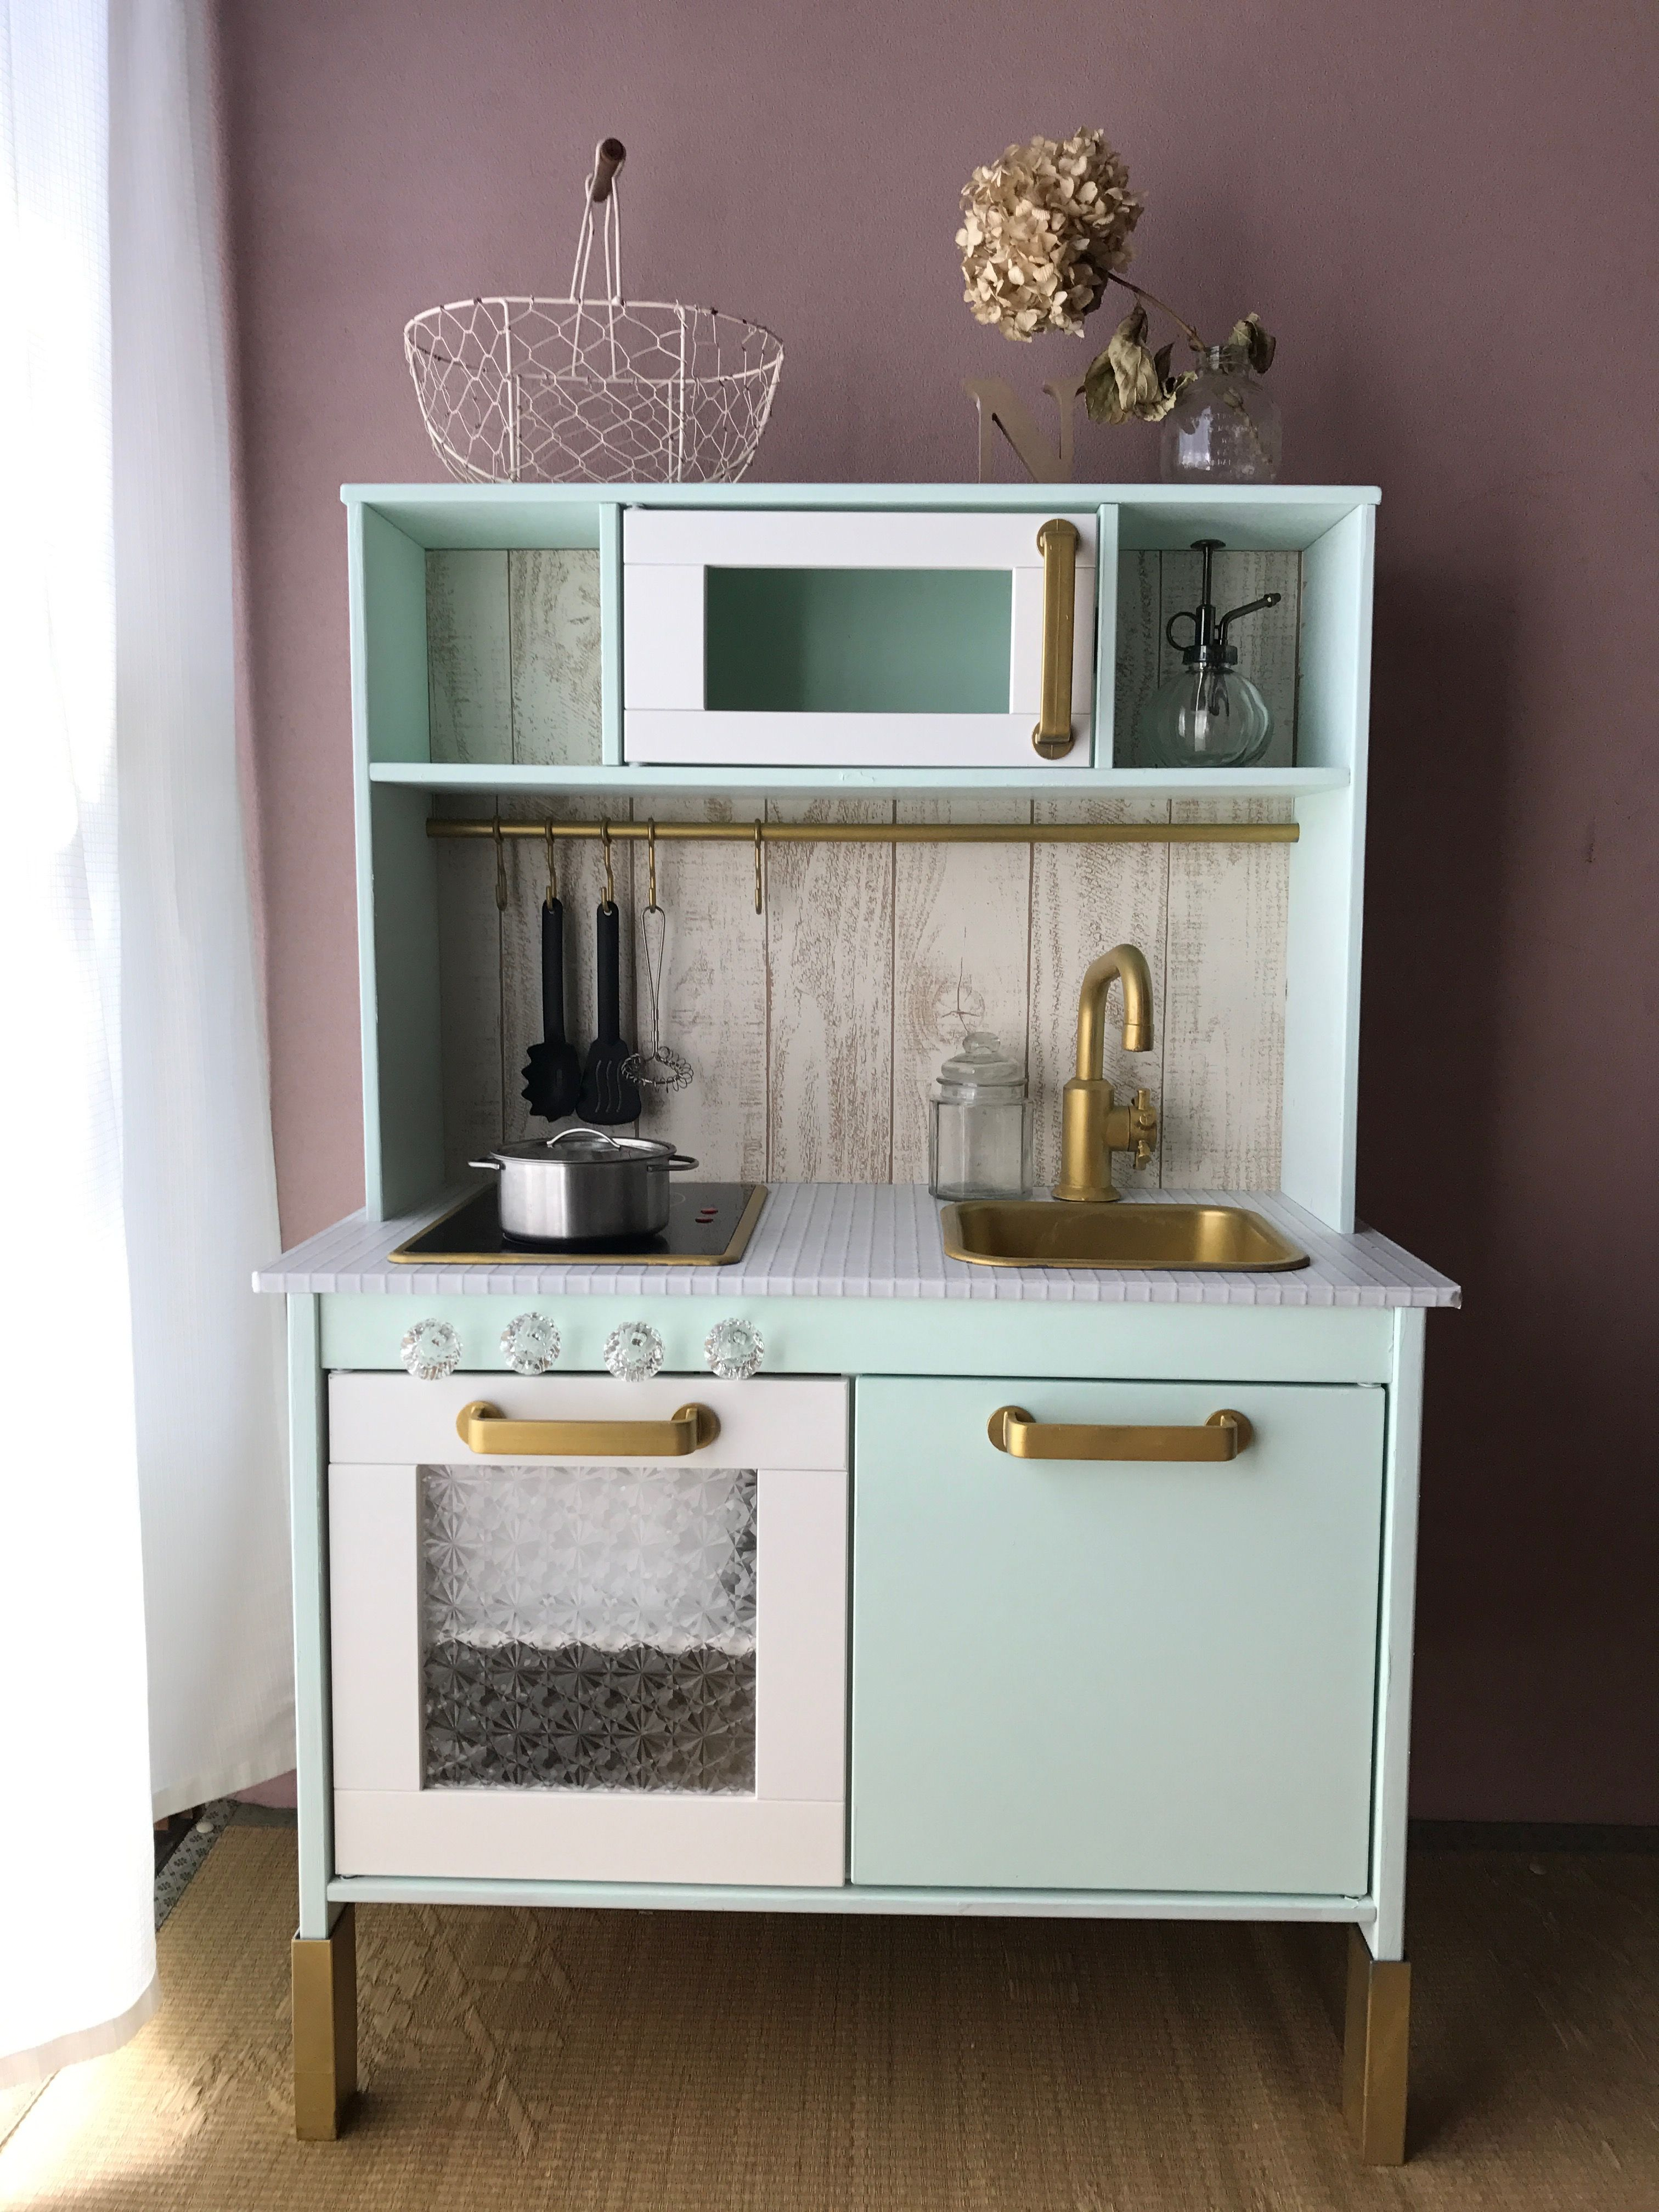 IKEA play kitchen,DIY | cucina bimbi ikea in 2018 | Pinterest ...